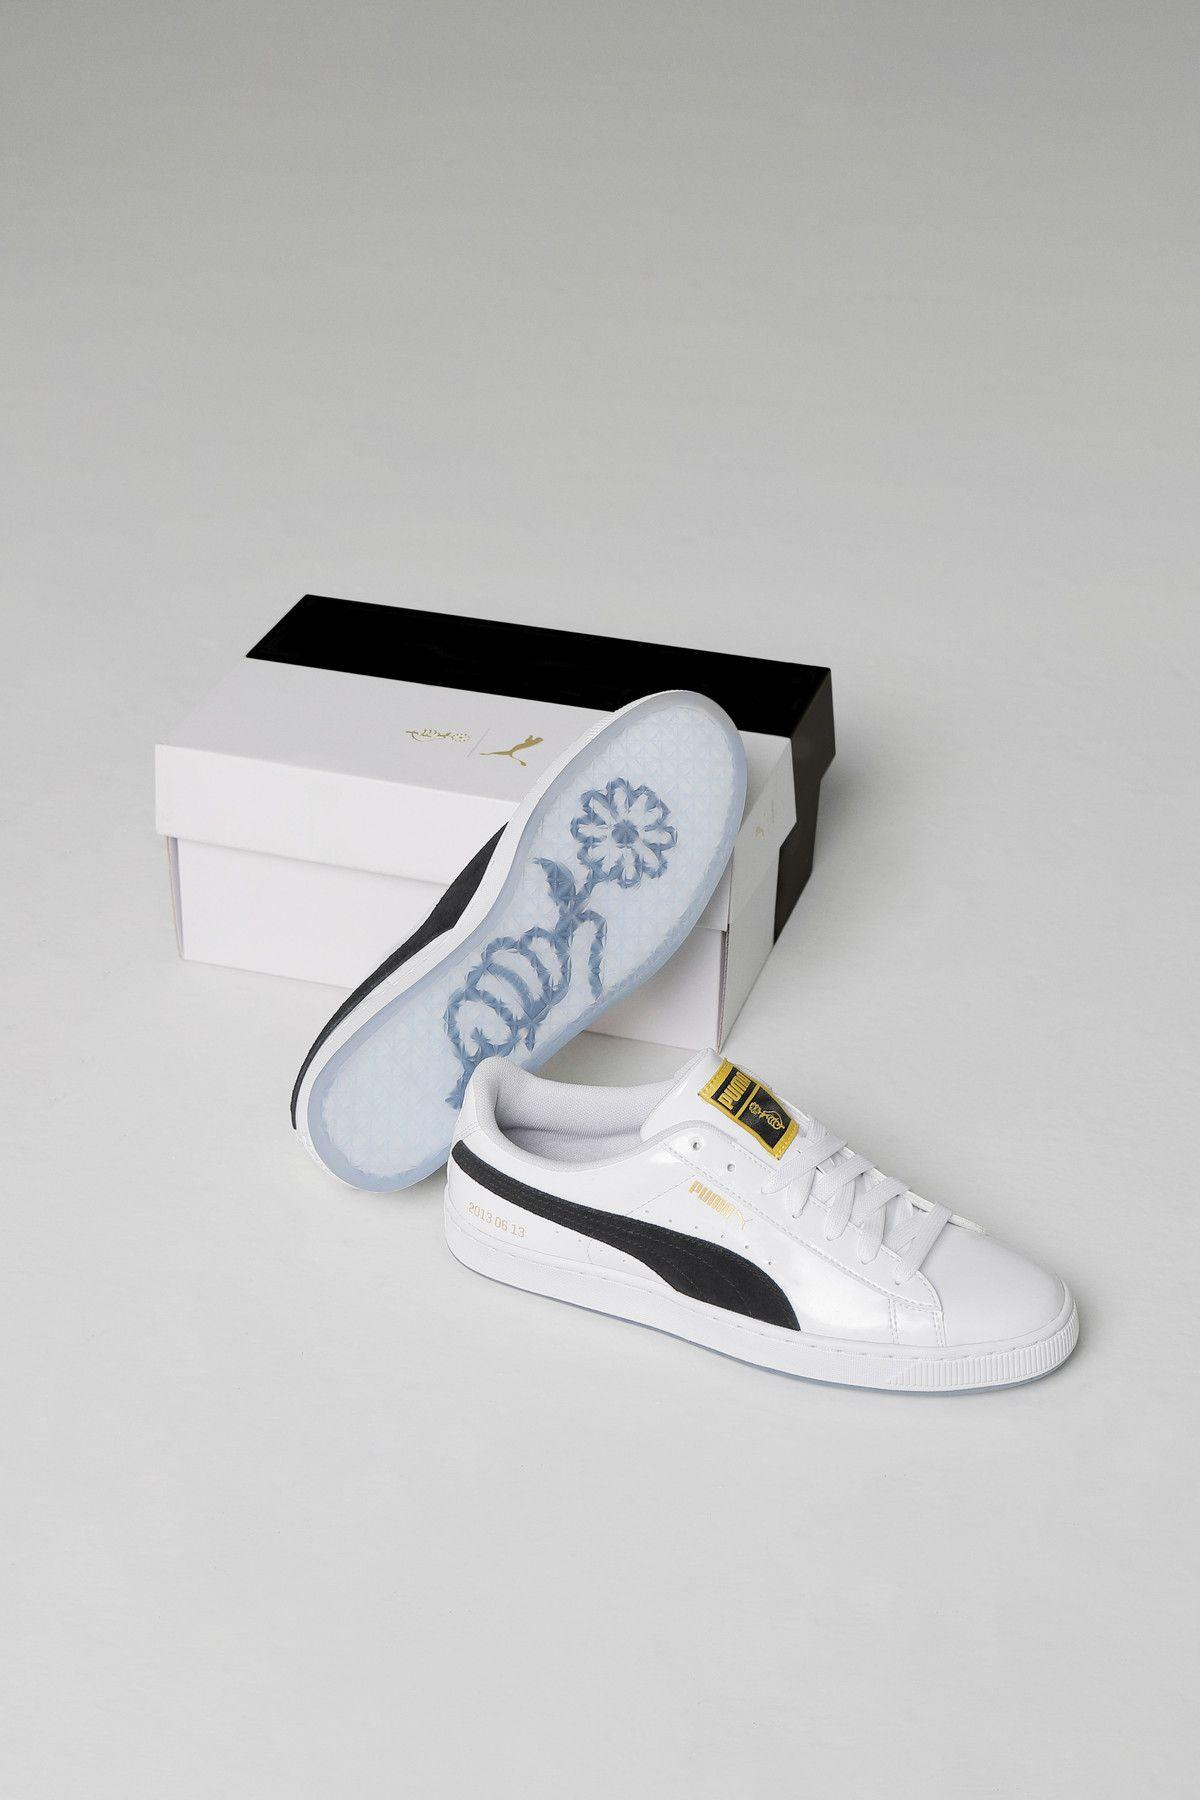 2bts puma scarpe